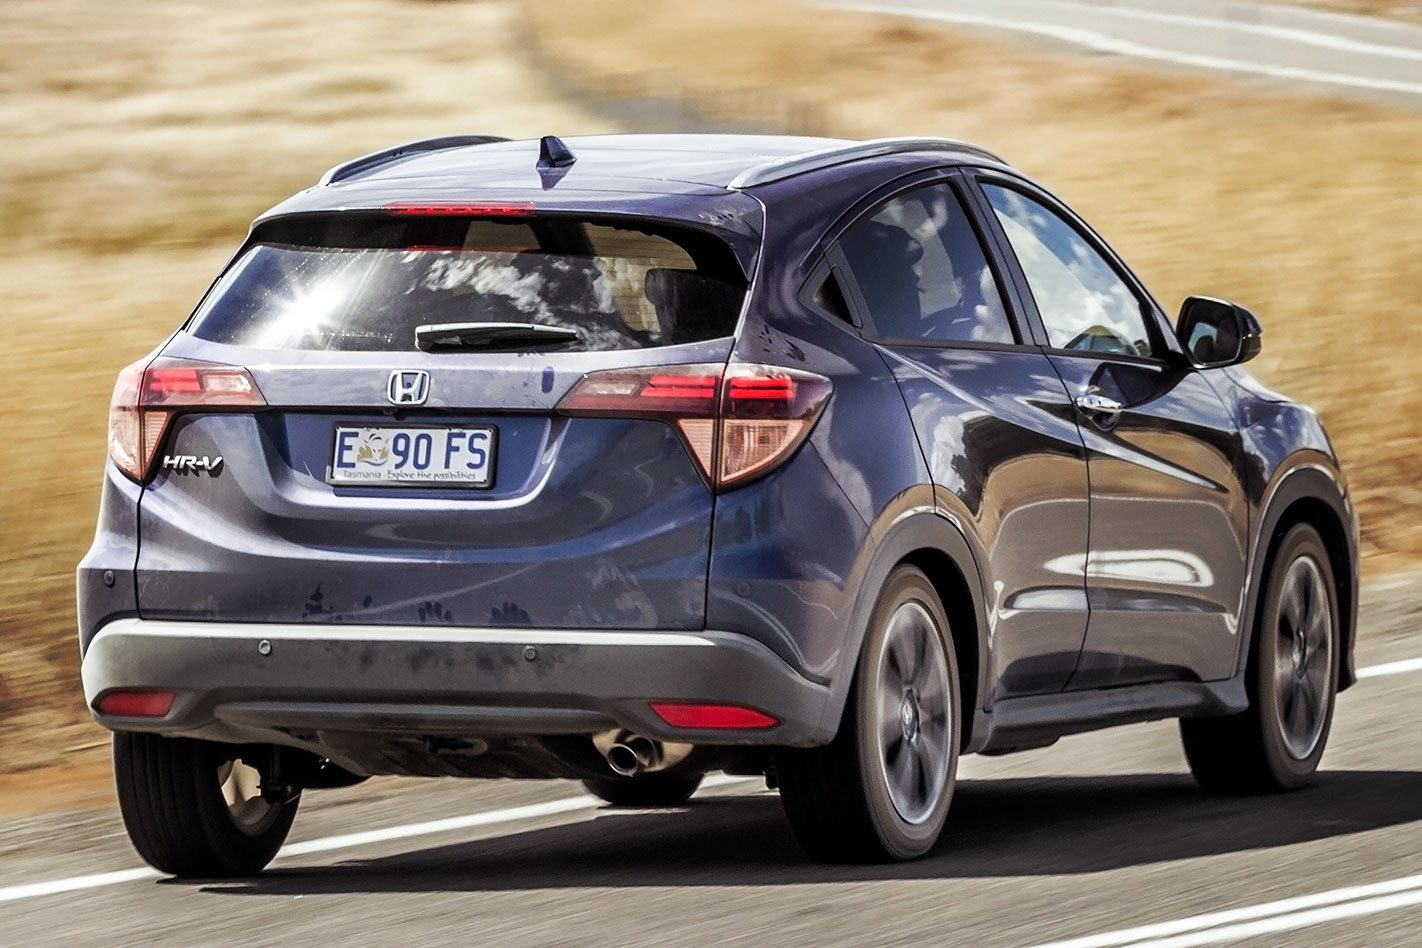 2017 honda hr v review for Honda hr v review